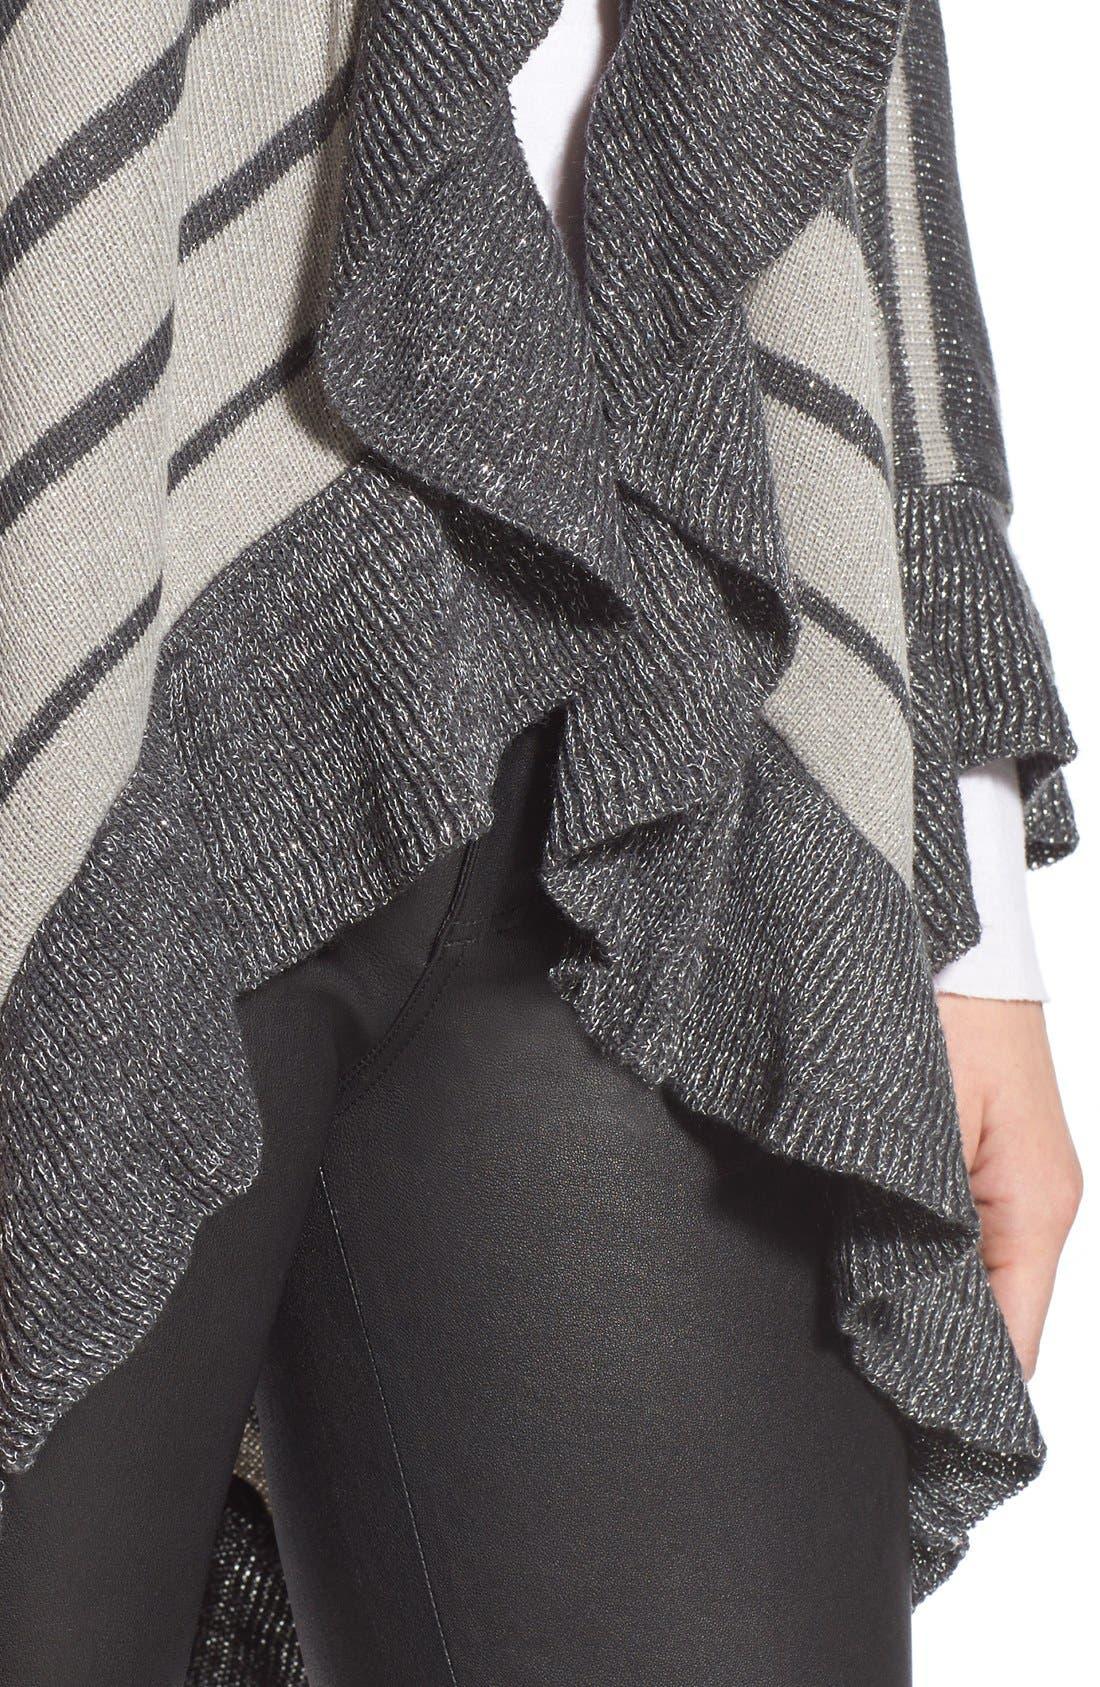 Stripe Shawl,                             Alternate thumbnail 5, color,                             Grey/ Ivory